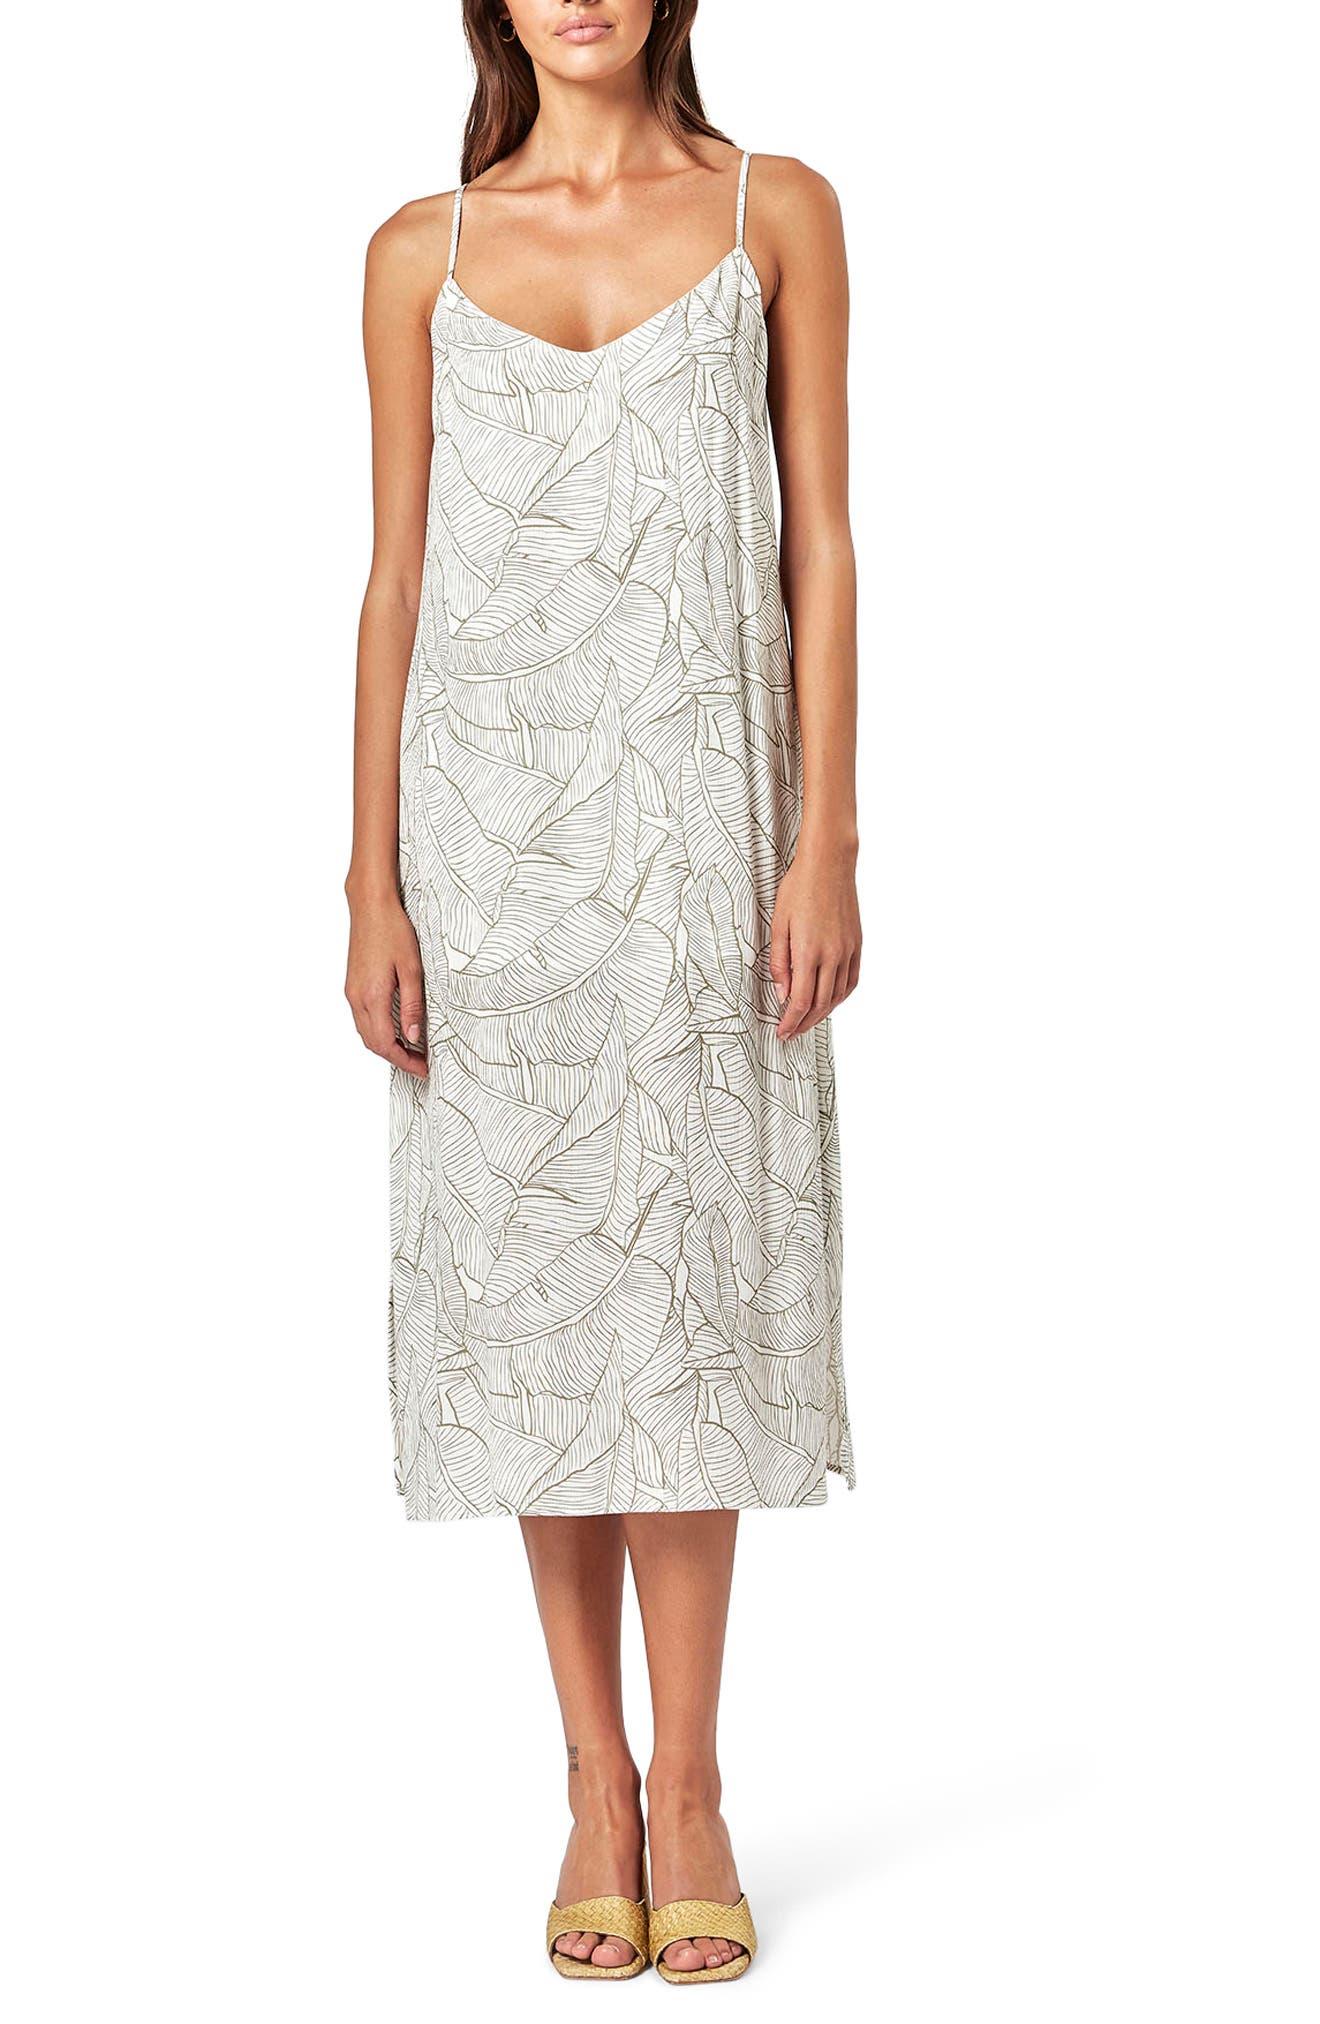 Zen Midi Dress